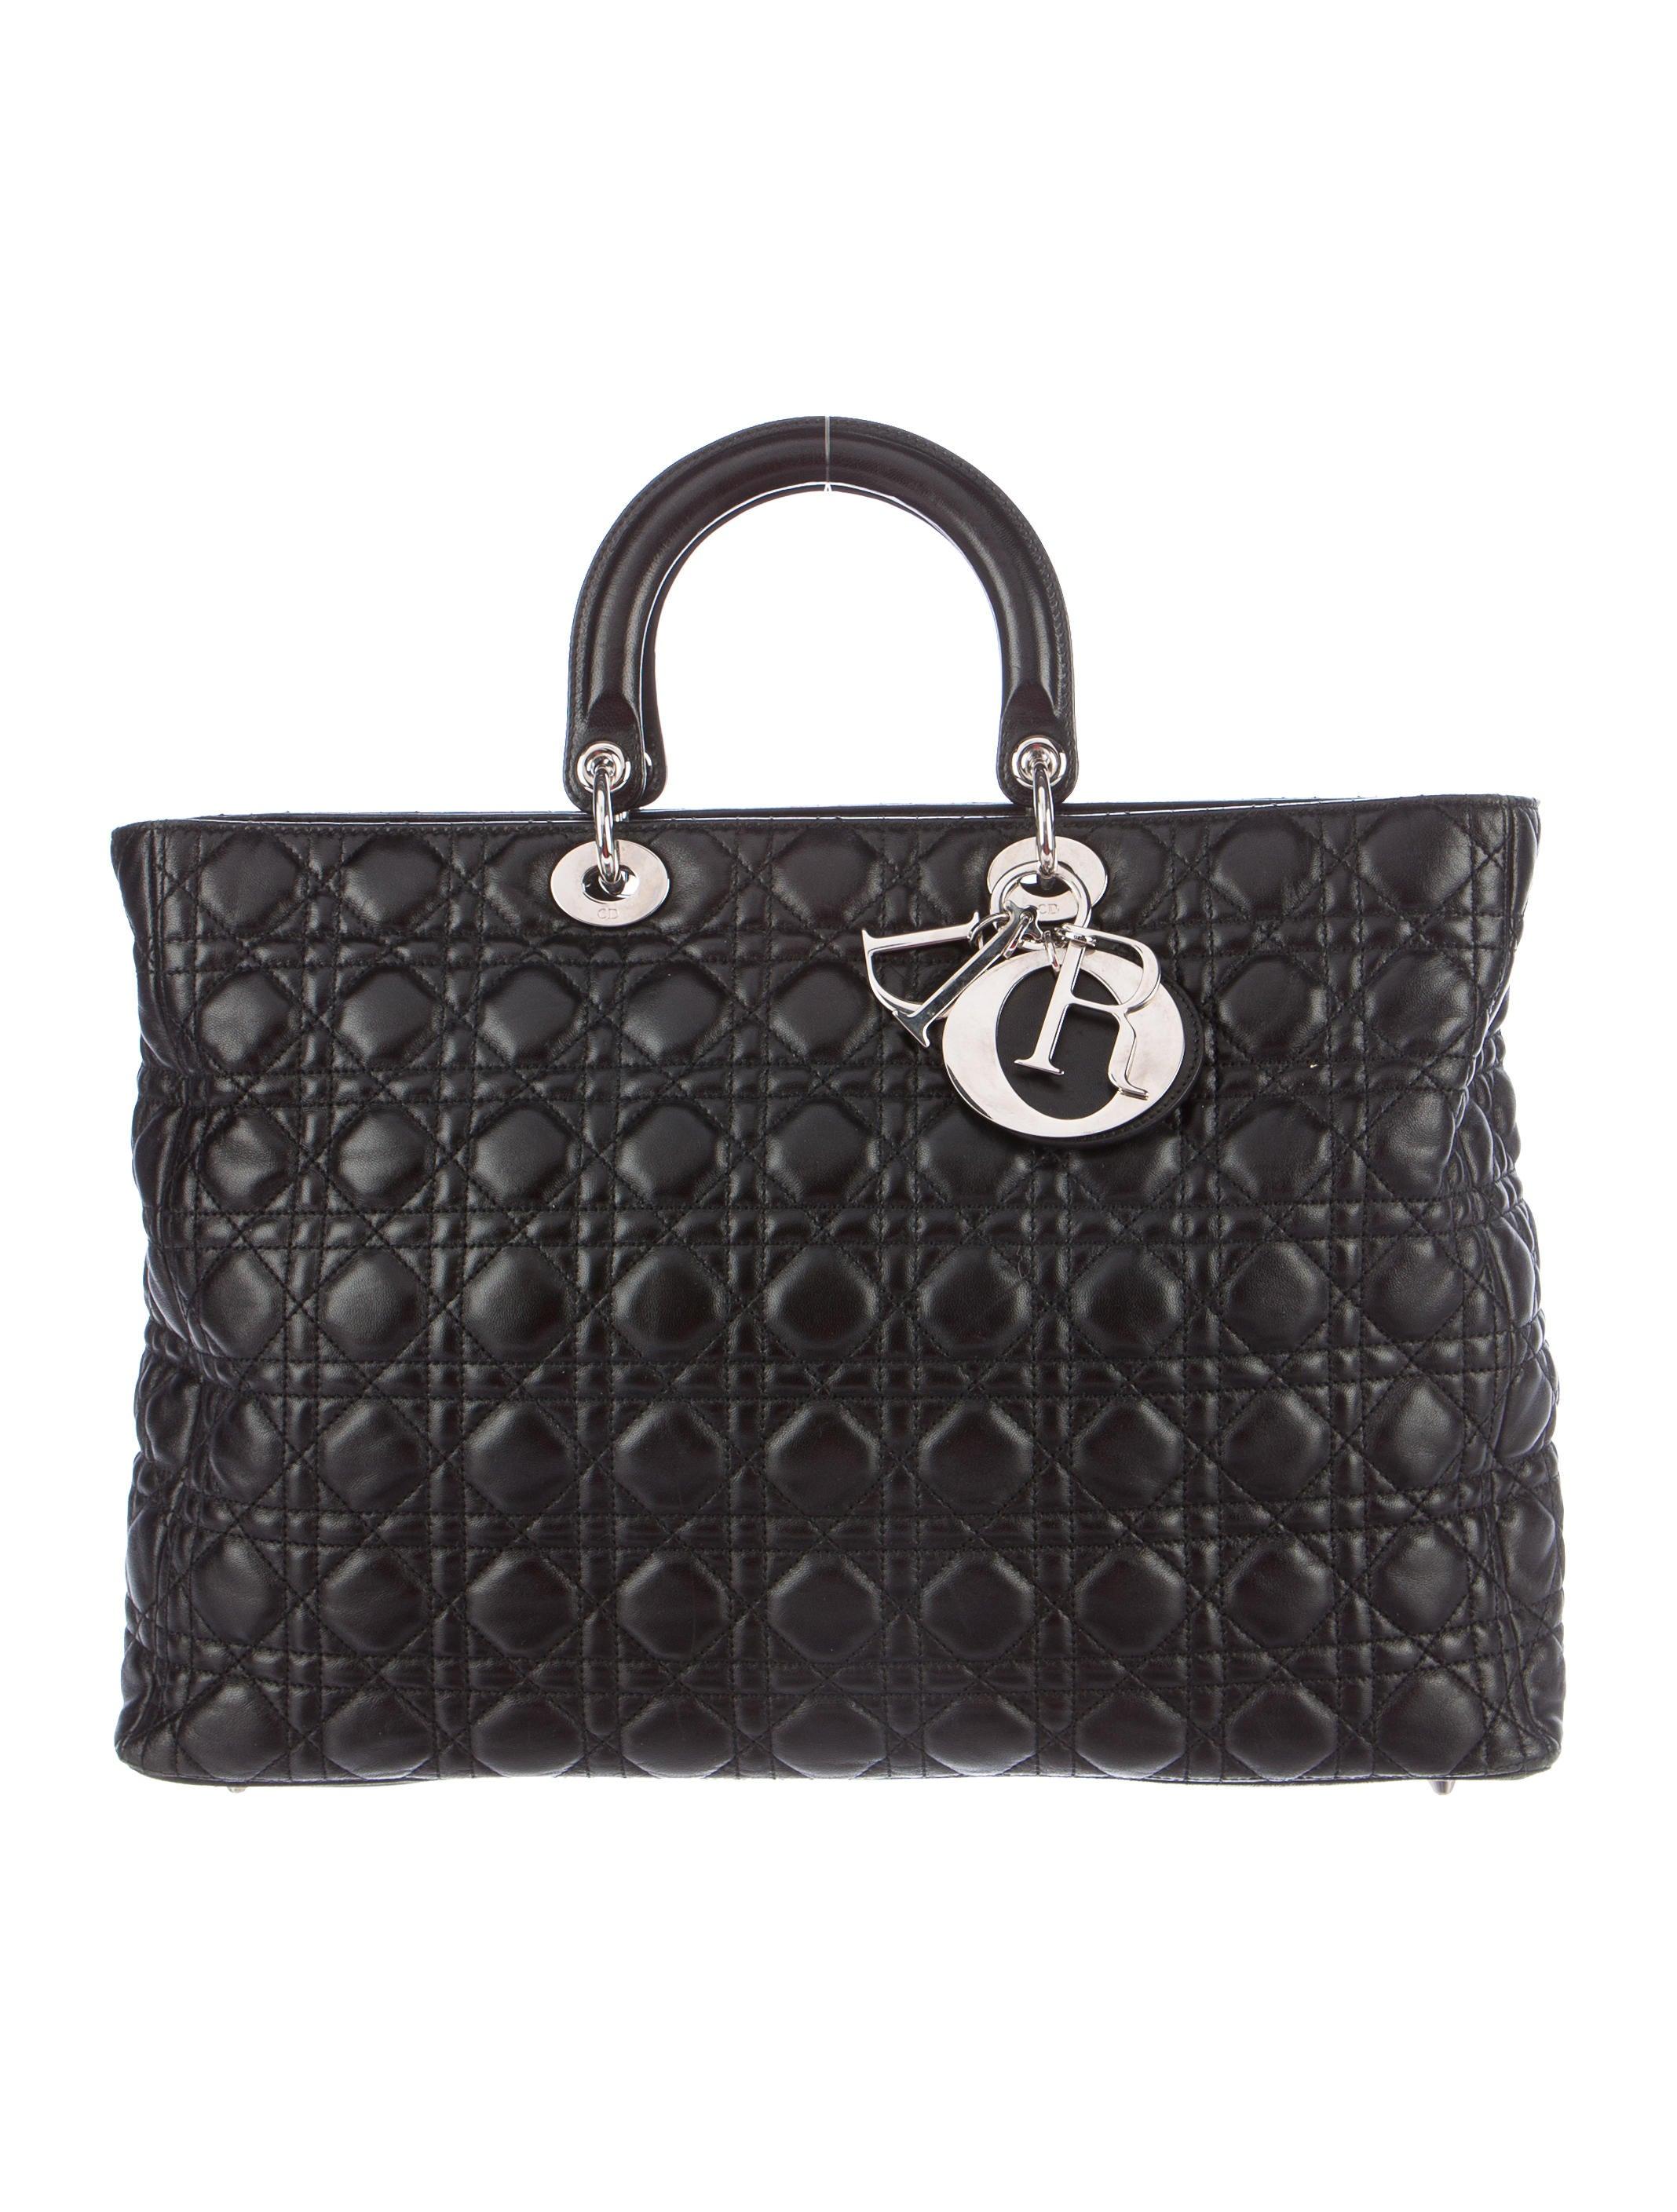 Dior bags online shop